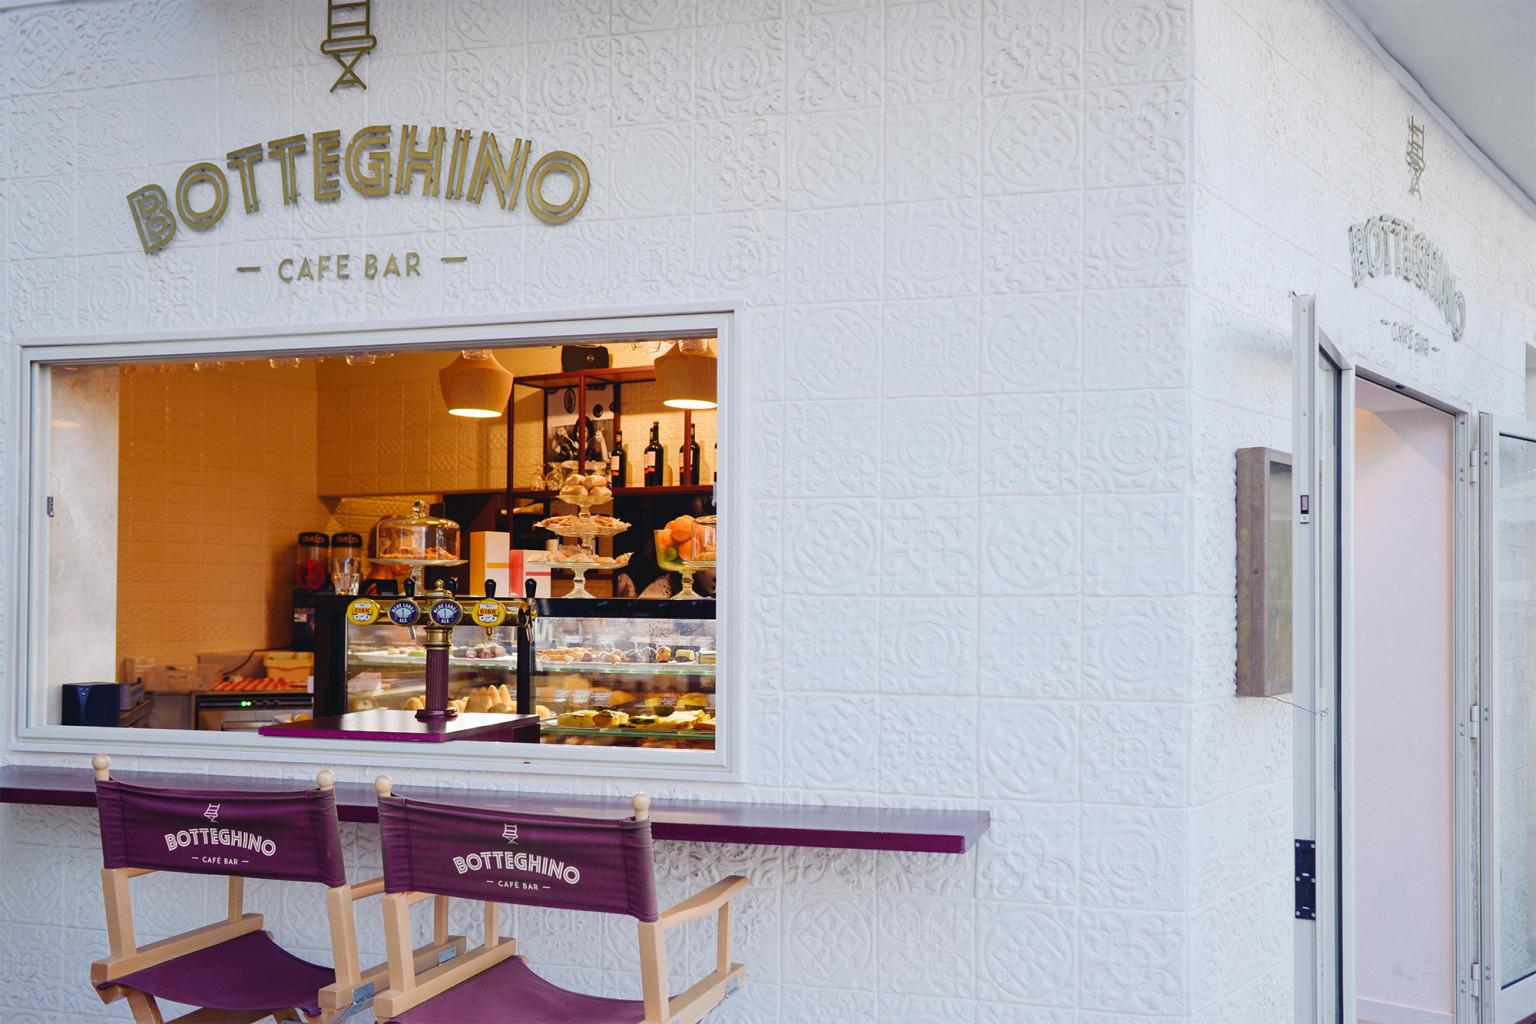 botteghino-02